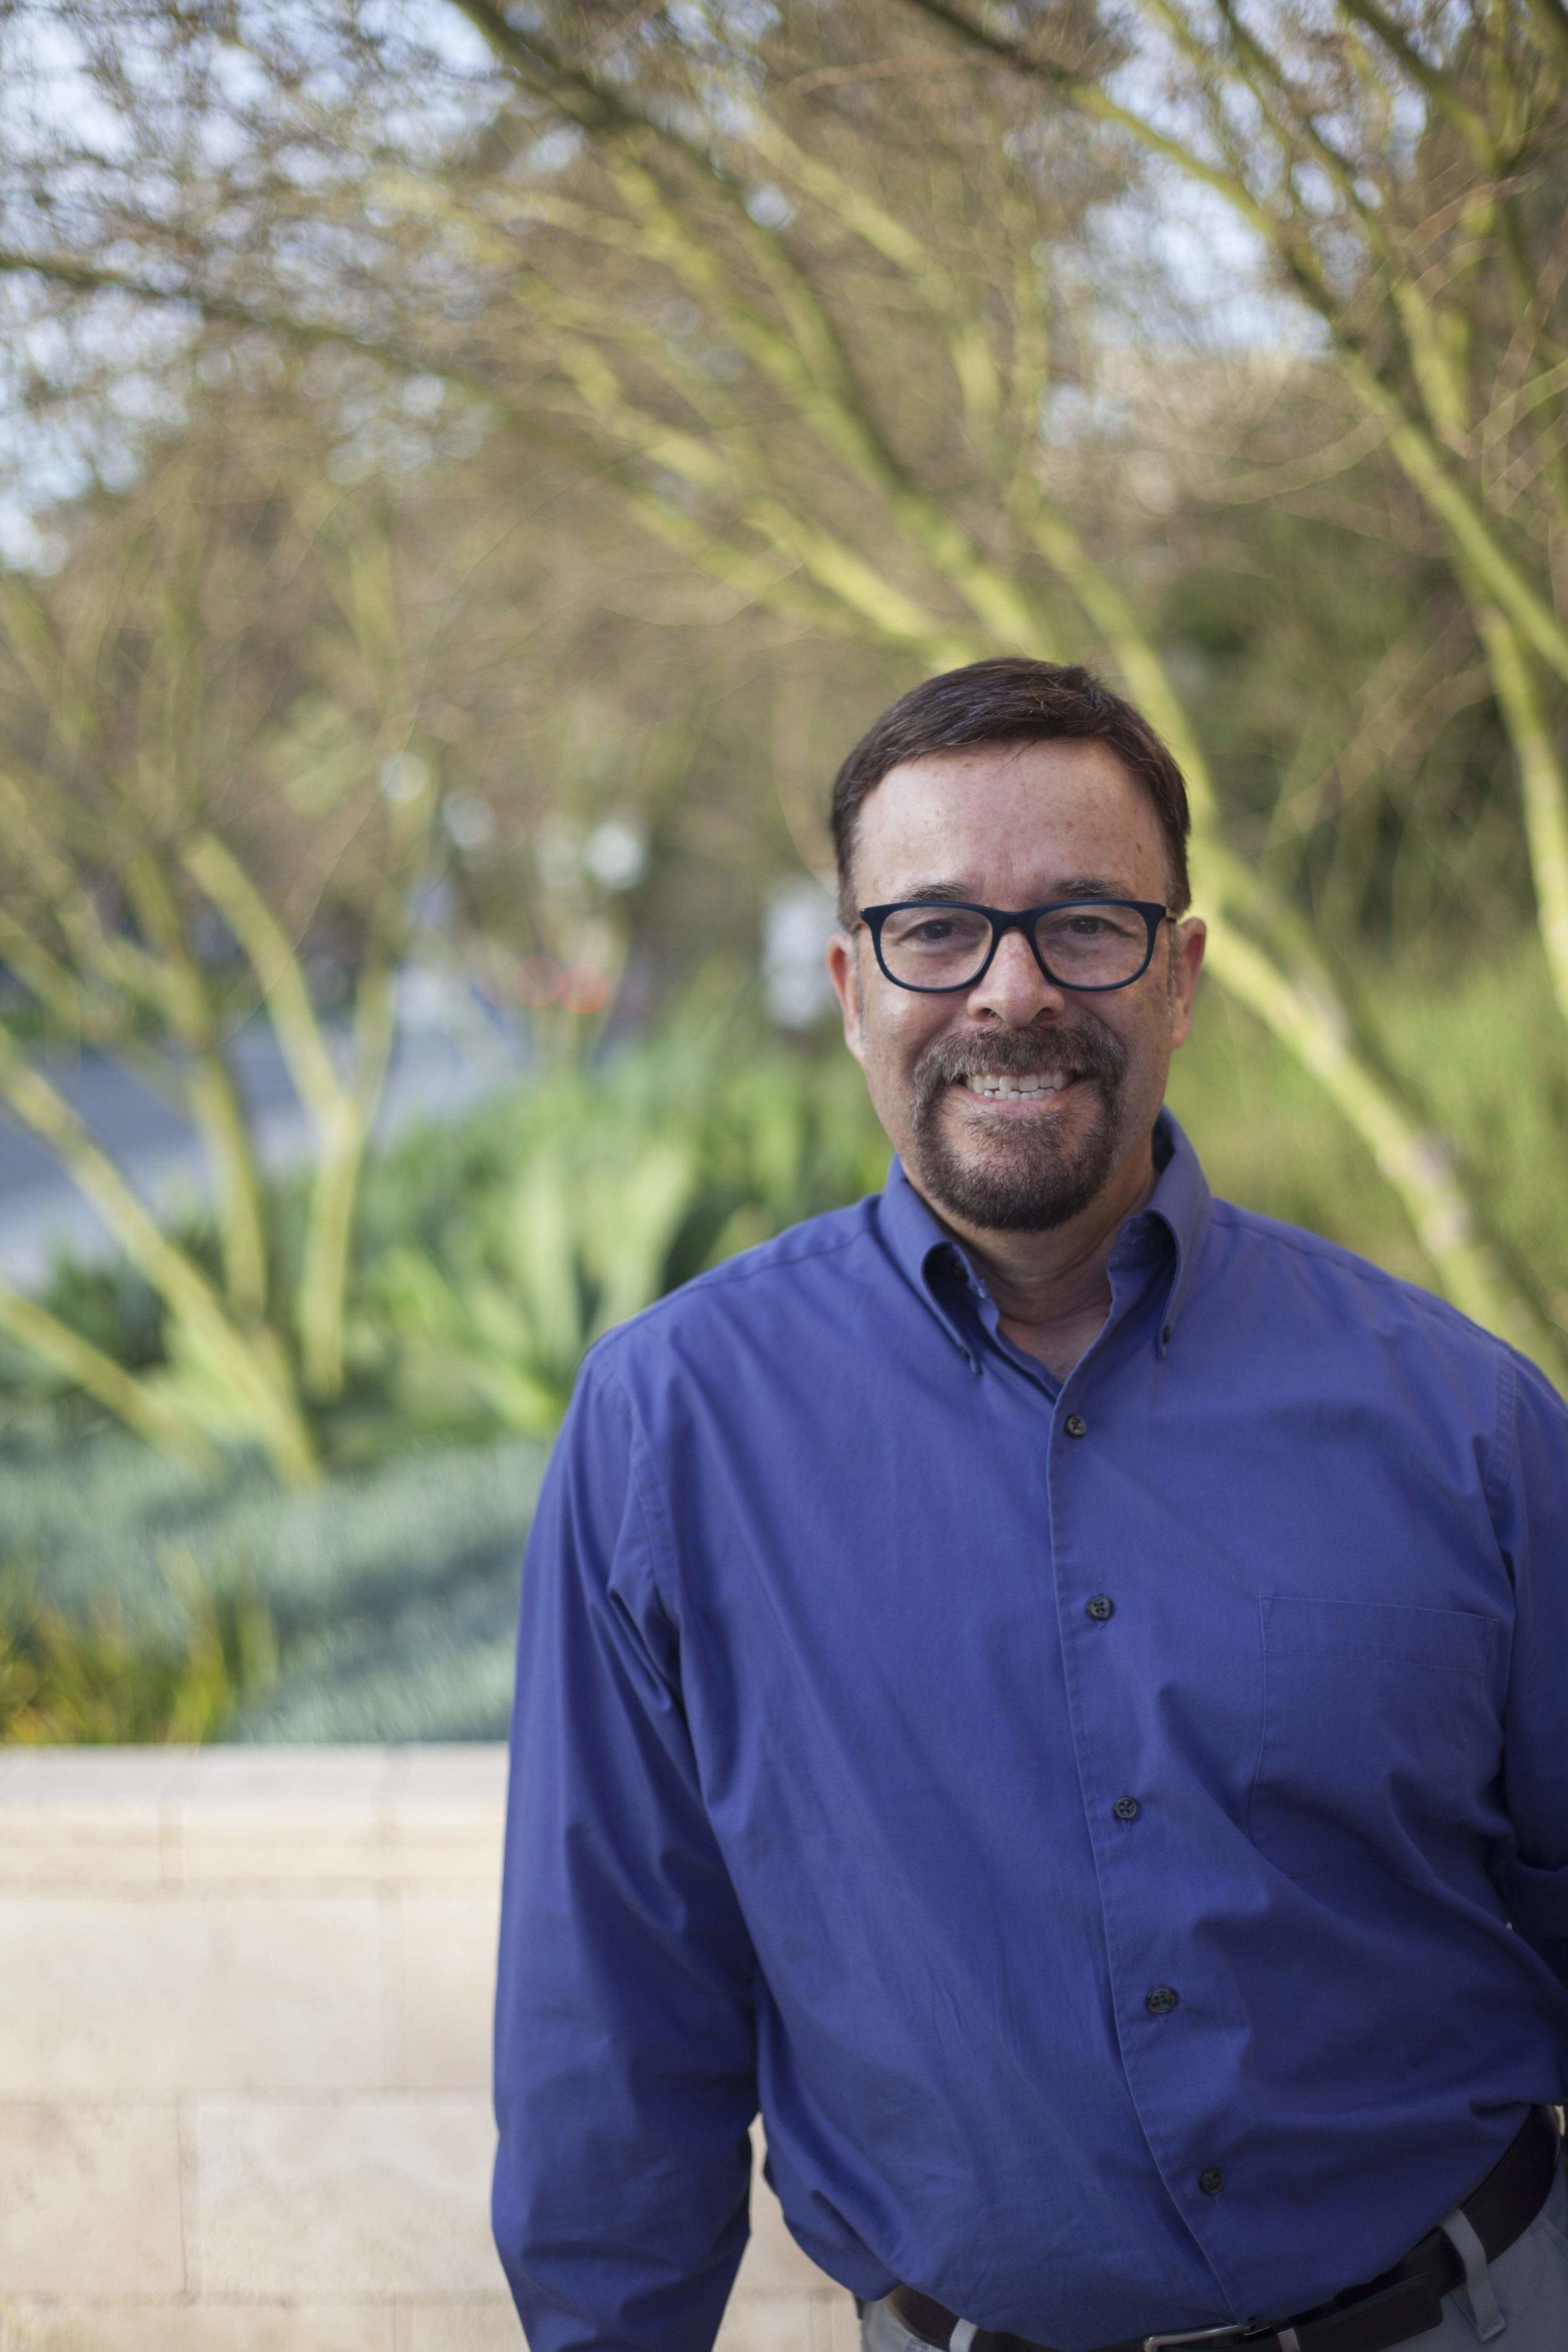 GABRIEL LOPEZ | Project Manager